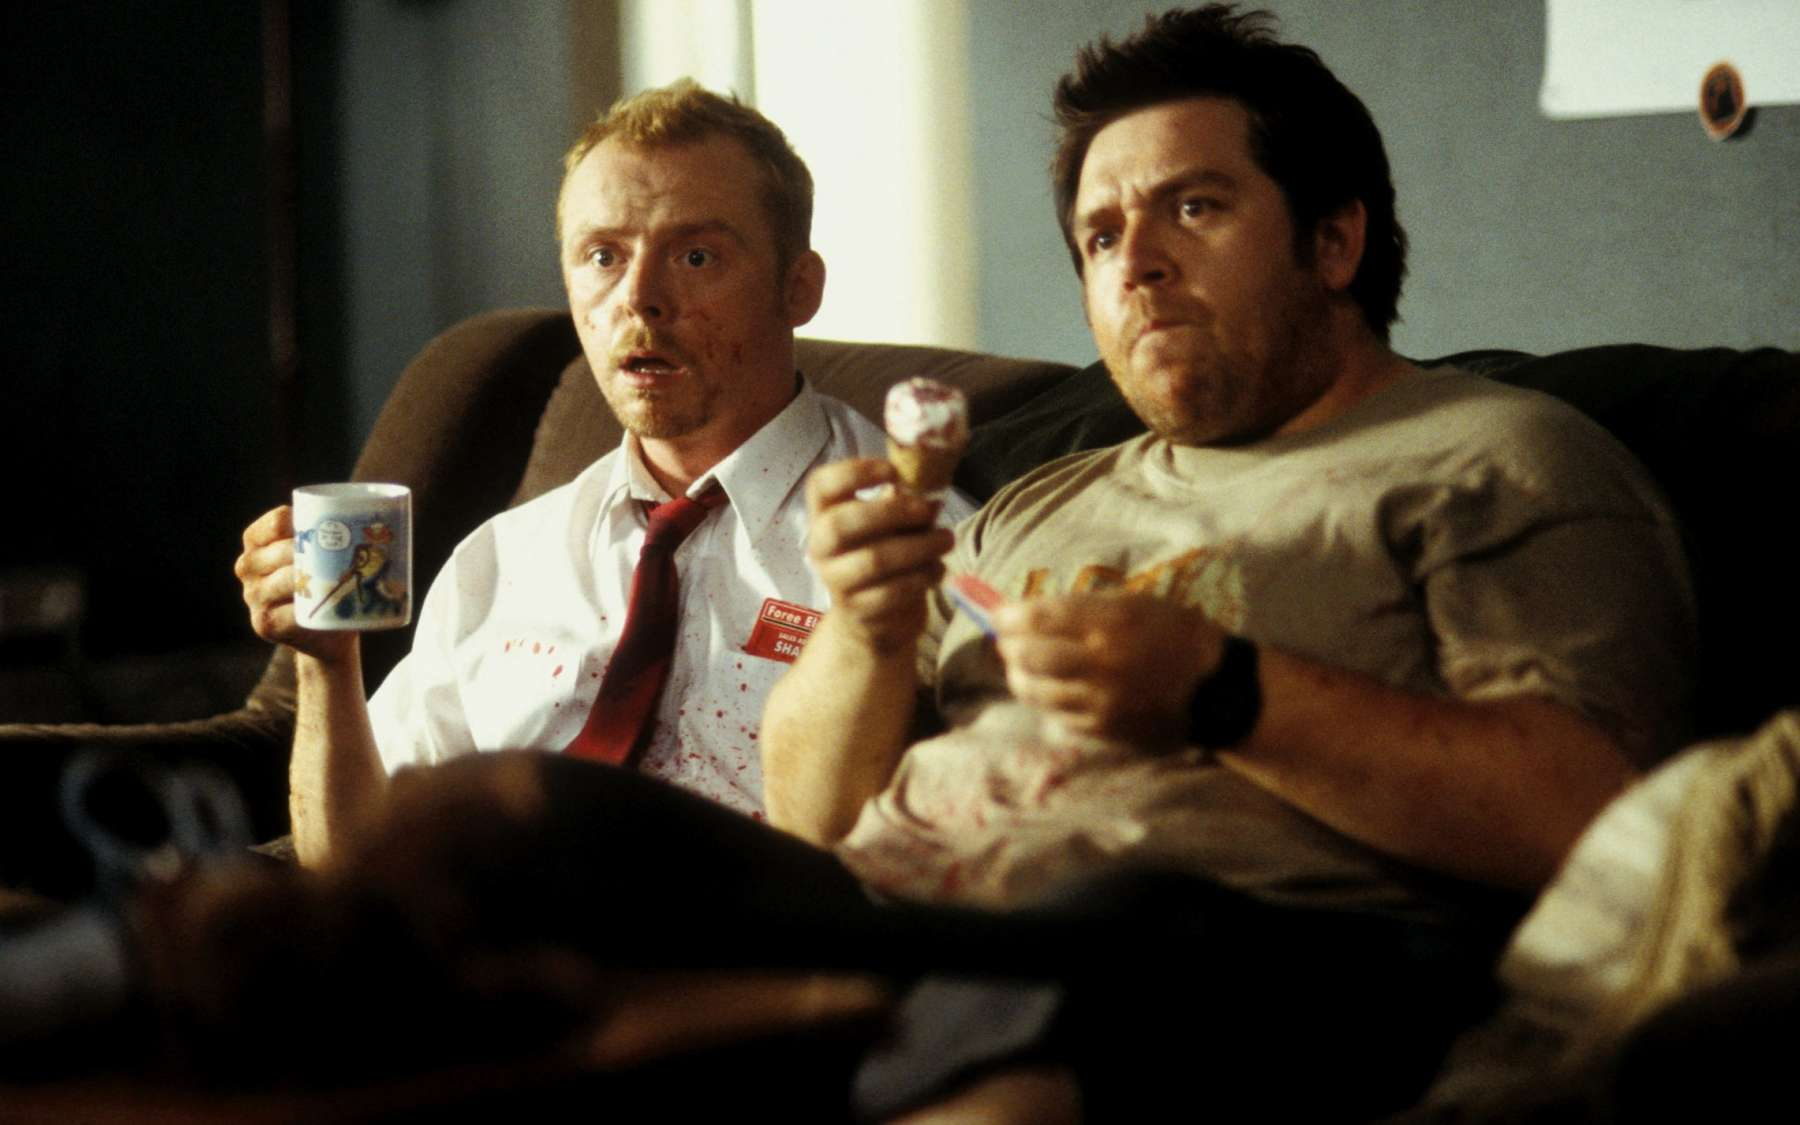 Simon Pegg et Nick Frost dans Shaun of the Dead de Edgar Wright. © StudioCanal, Universal Pictures